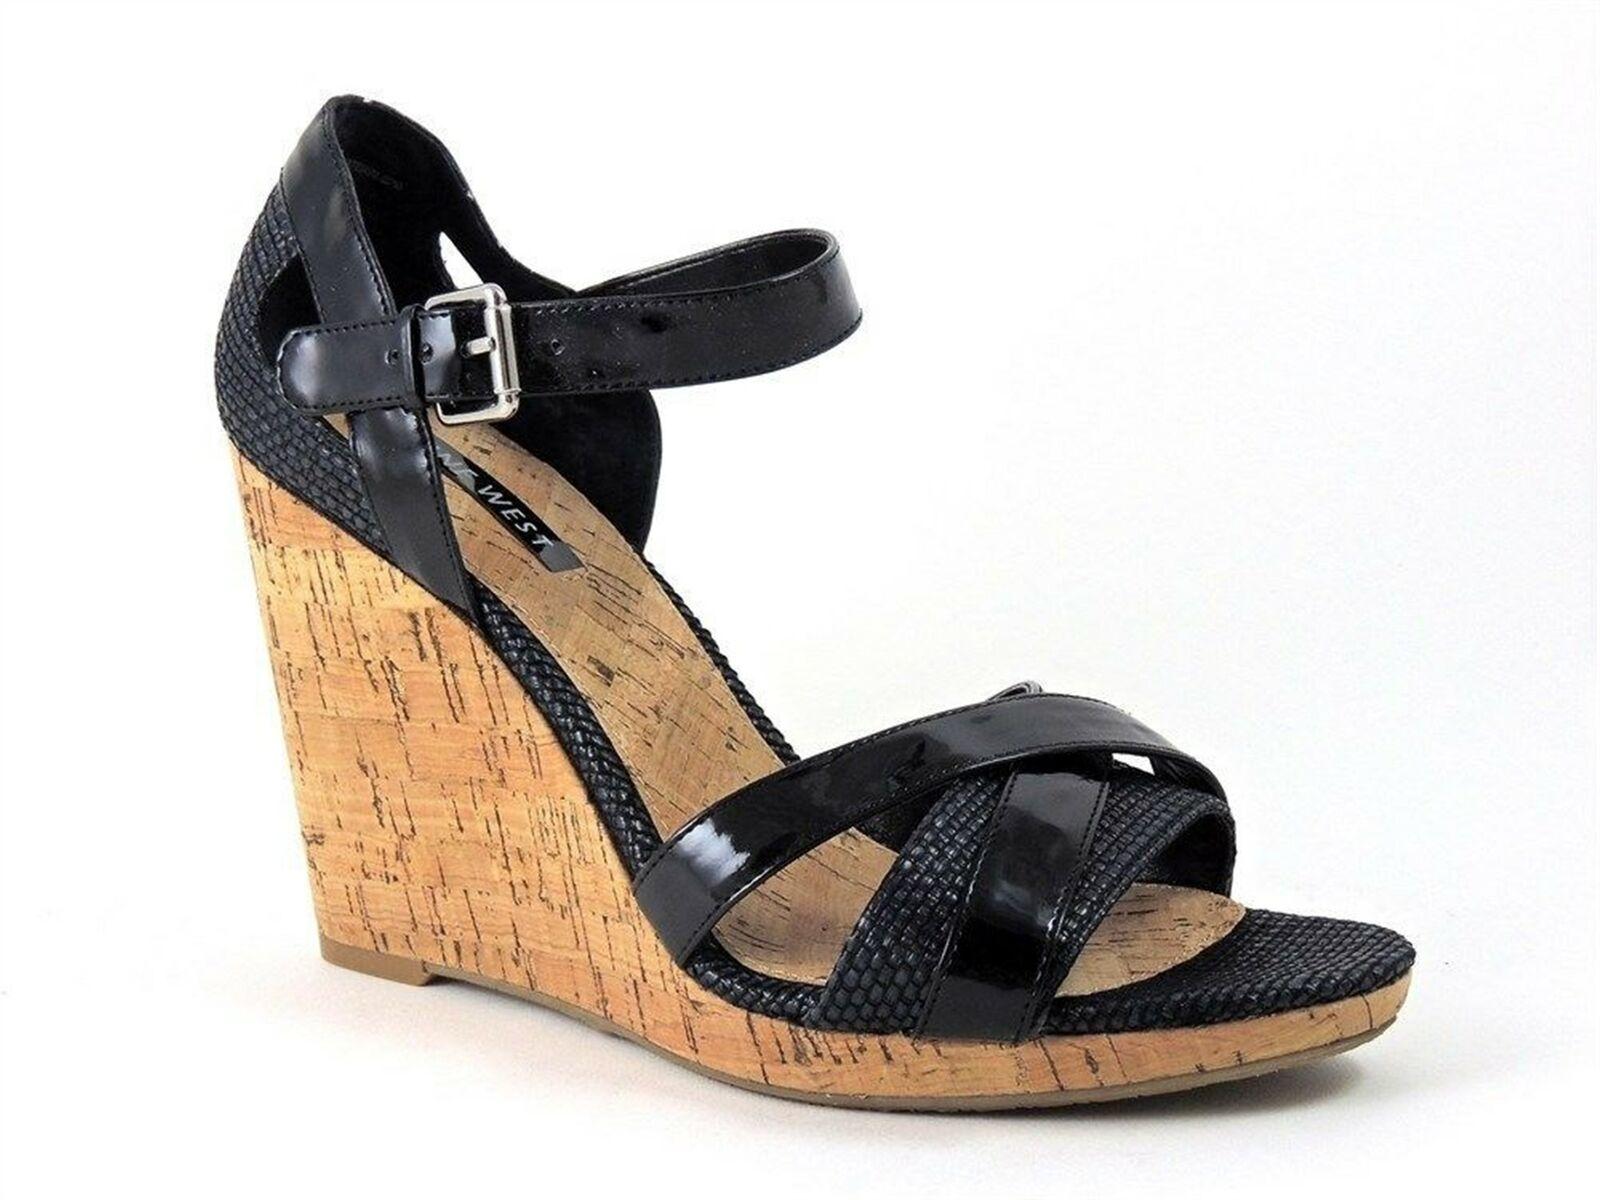 Nine West Women's Birthday Bdayo Wedge Sandals Black Size 10 M